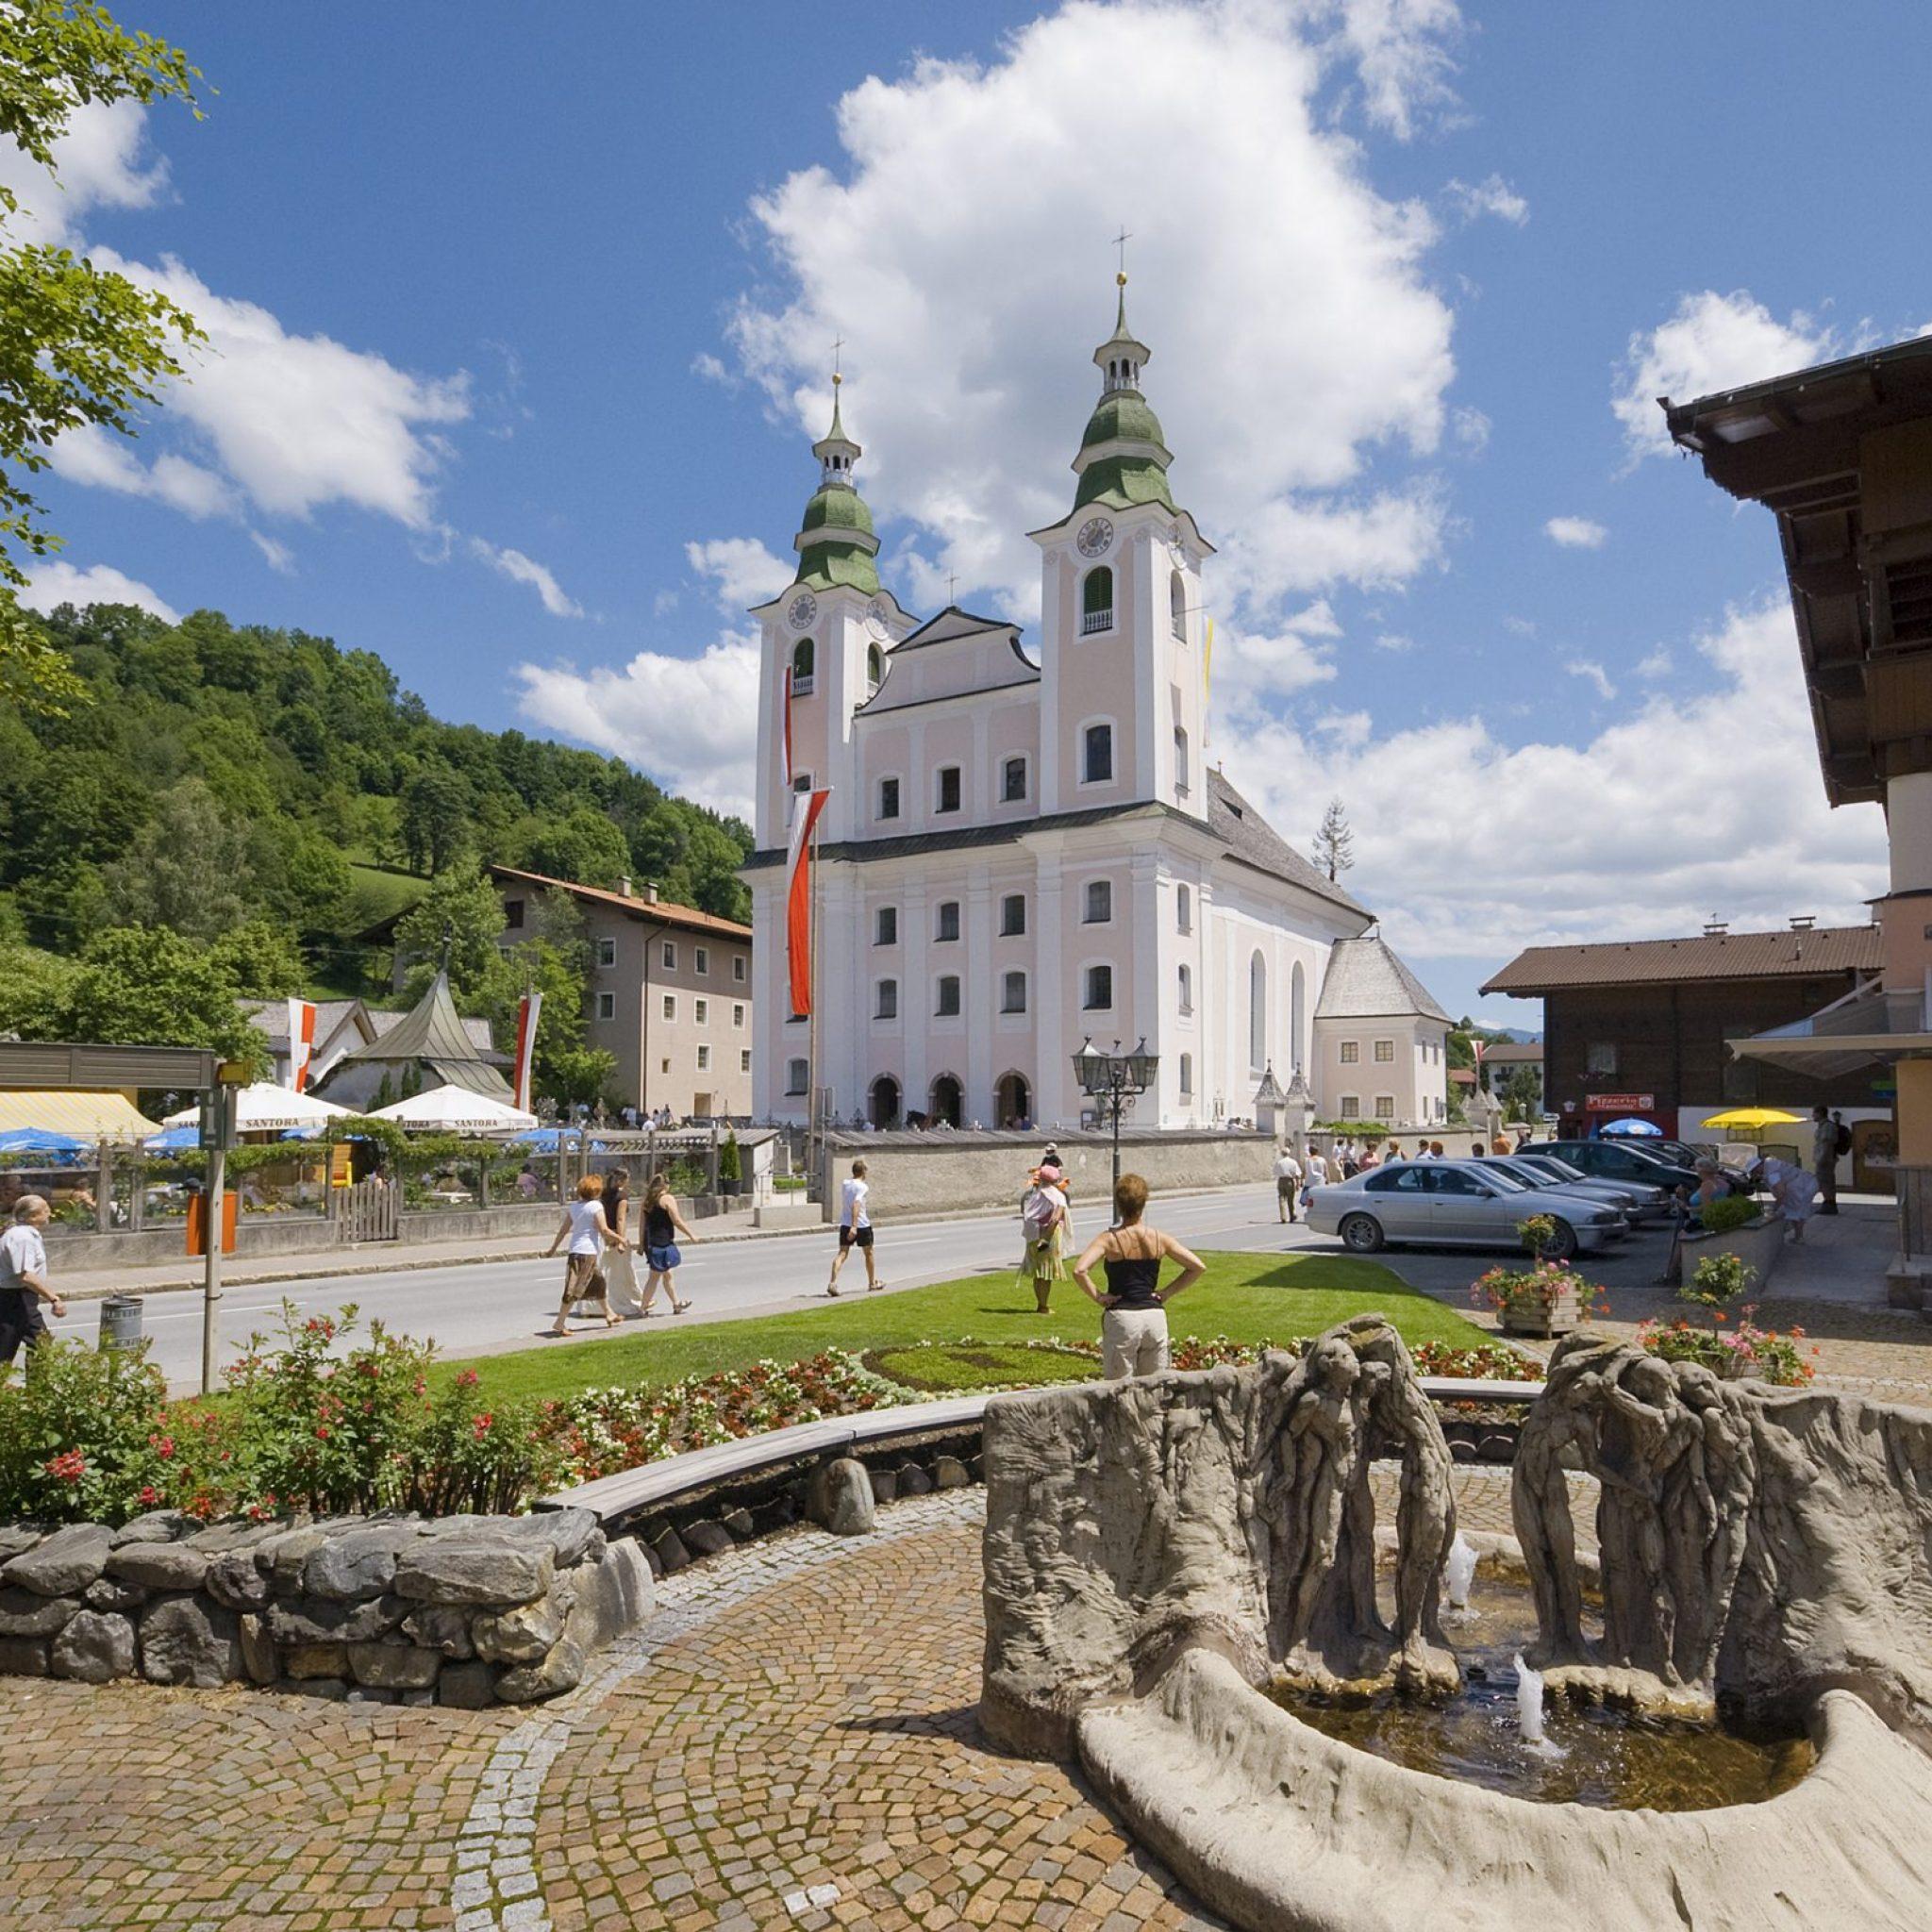 Brixen im Thale, Aktivøstrig.dk